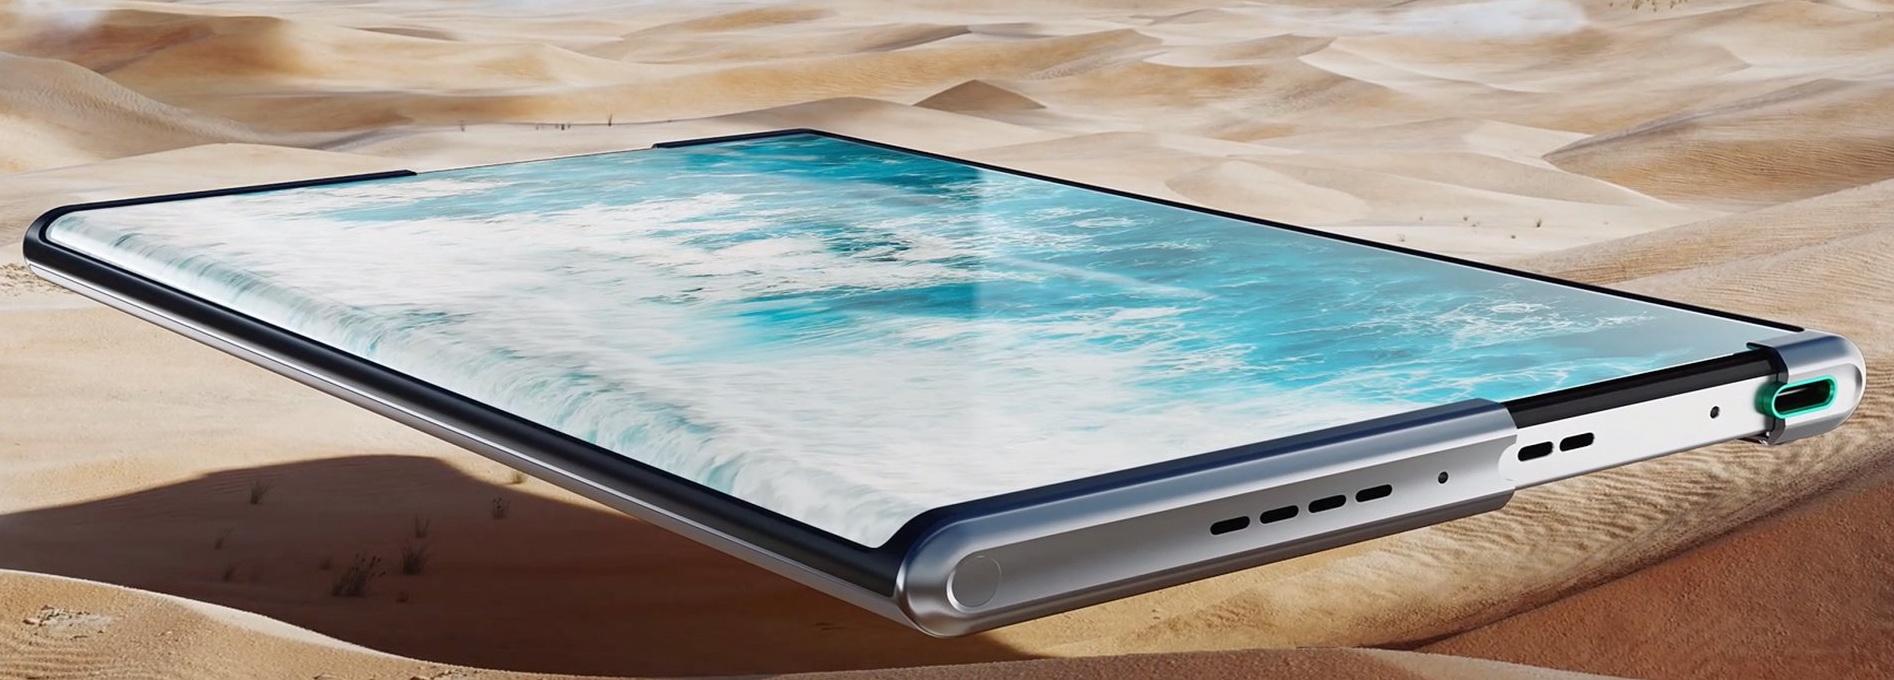 Анонс OPPO X 2021. Концепт-смартфон с необычным экраном Другие устройства  - oppo_inno_day_picture5_0